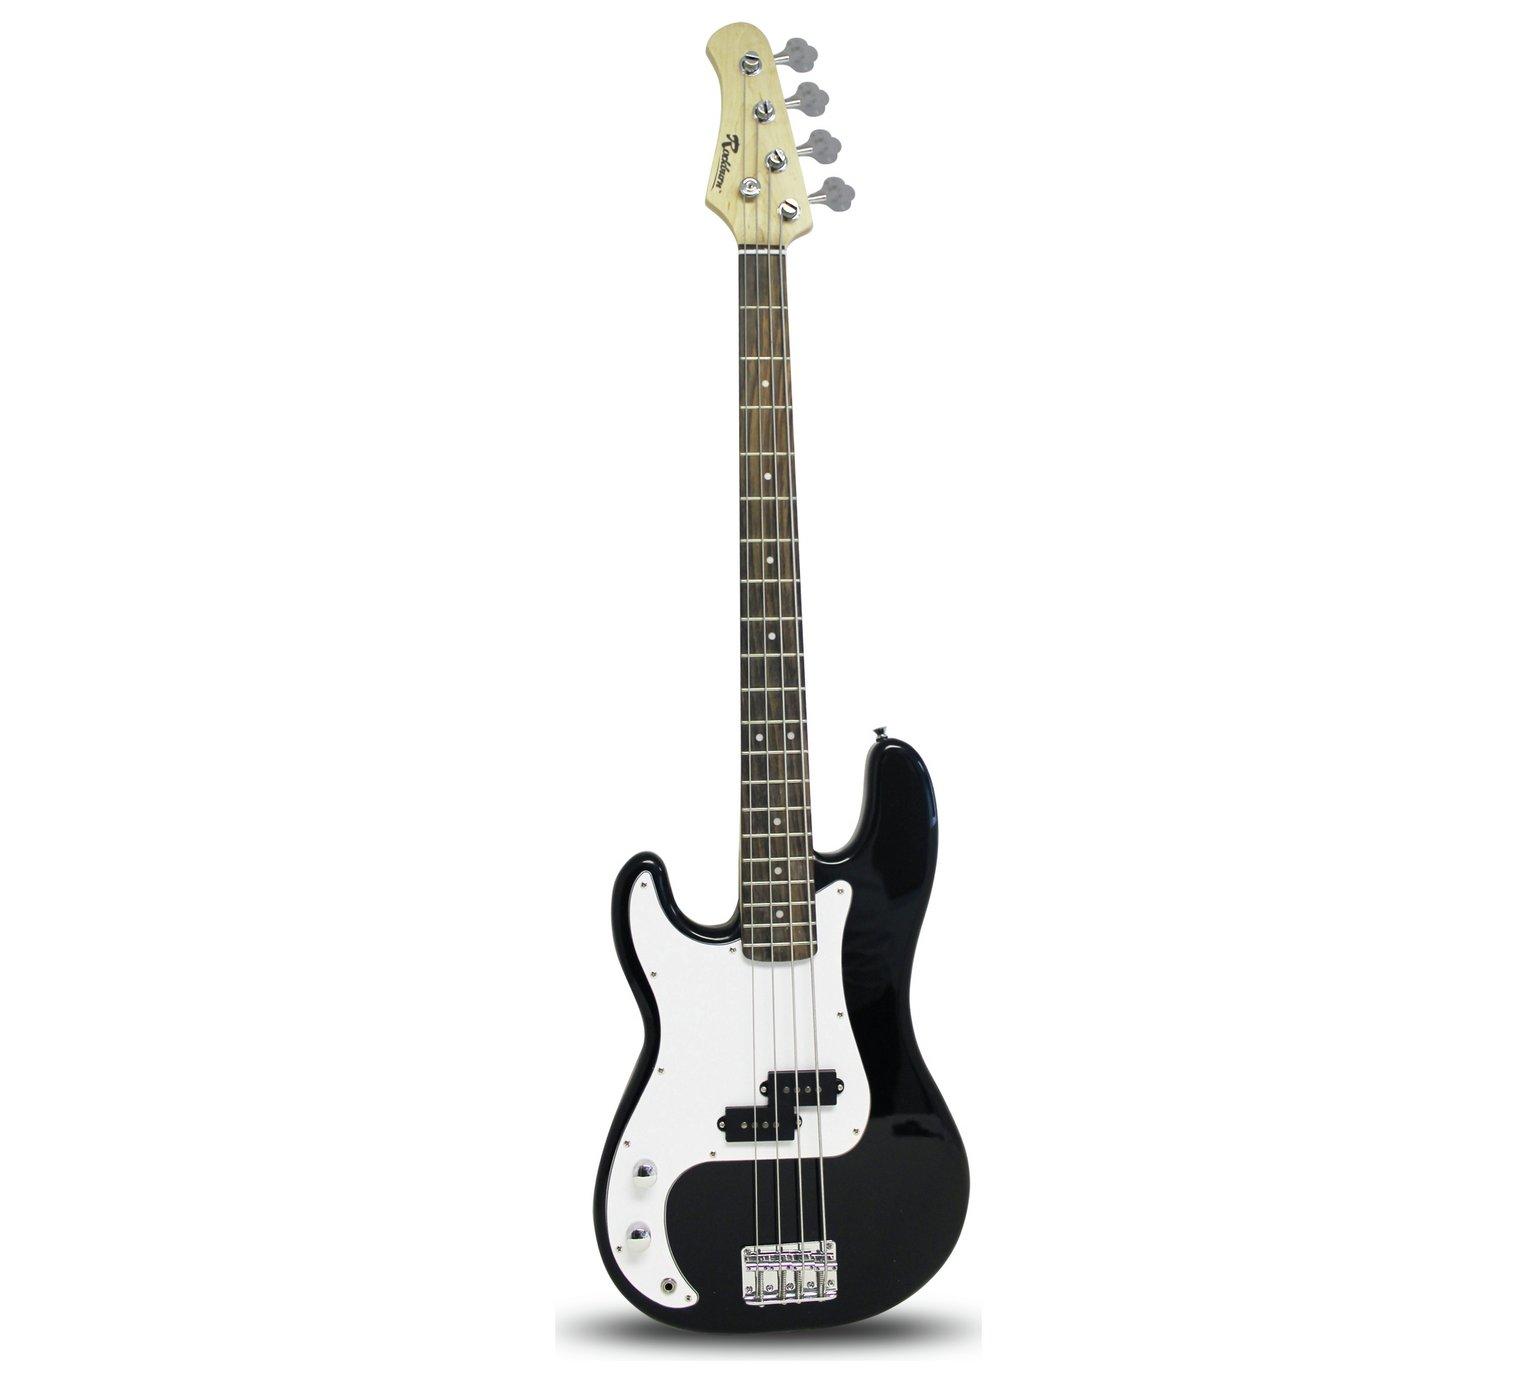 Rockburn Left Hand Bass Guitar - Black